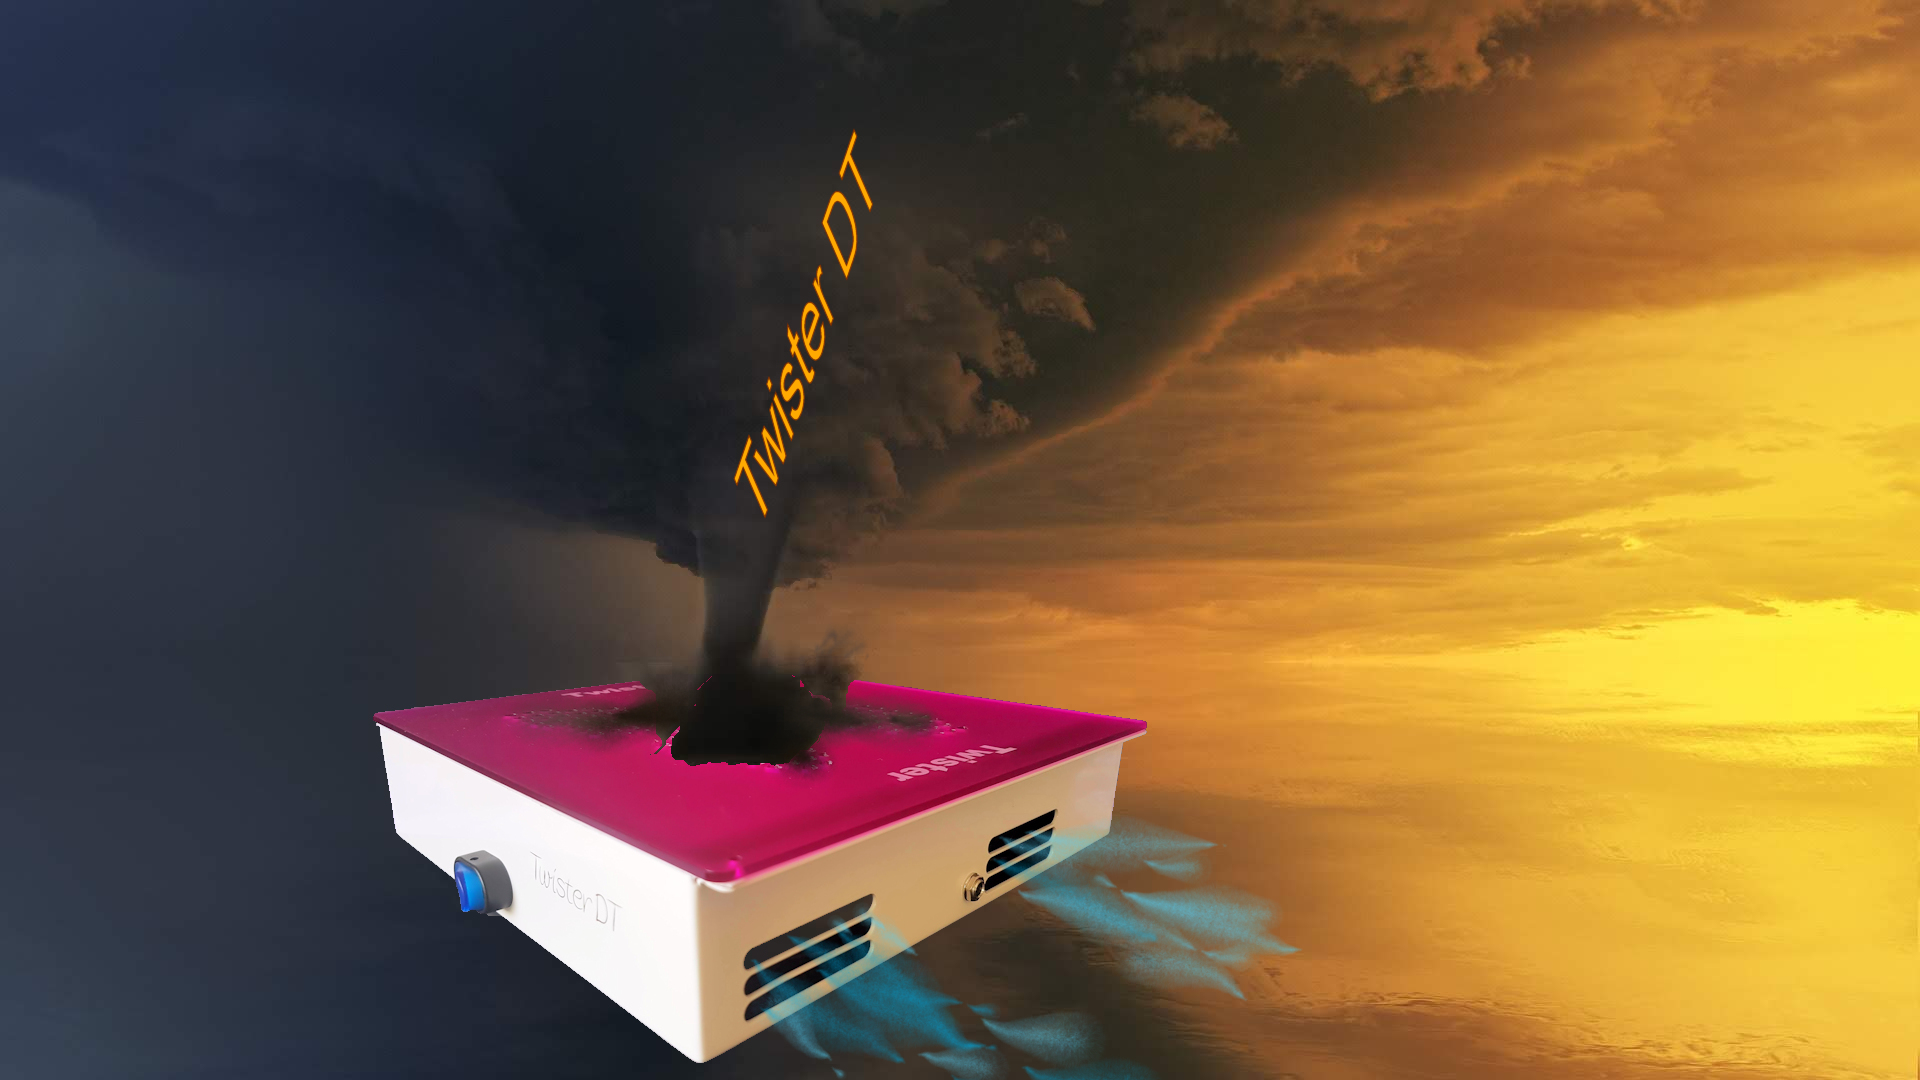 tornado-Twister1.jpg